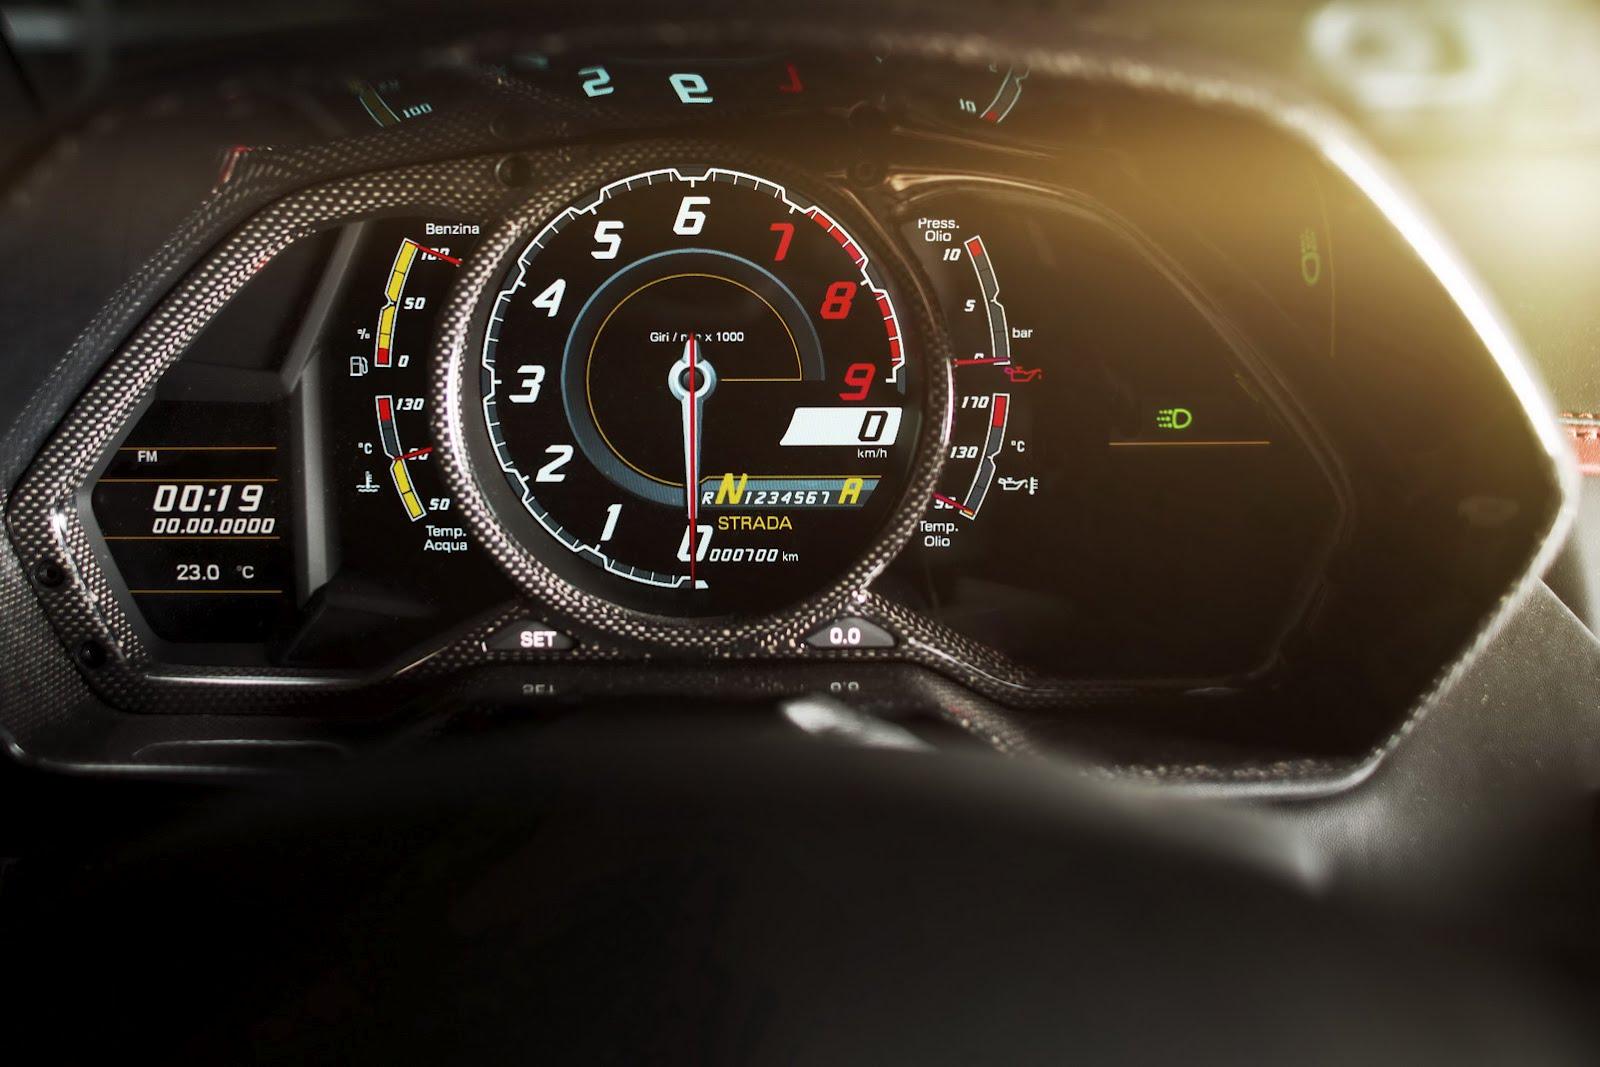 Mansory tuned lamborghini aventador carbonado - Lamborghini aventador interior wallpaper ...